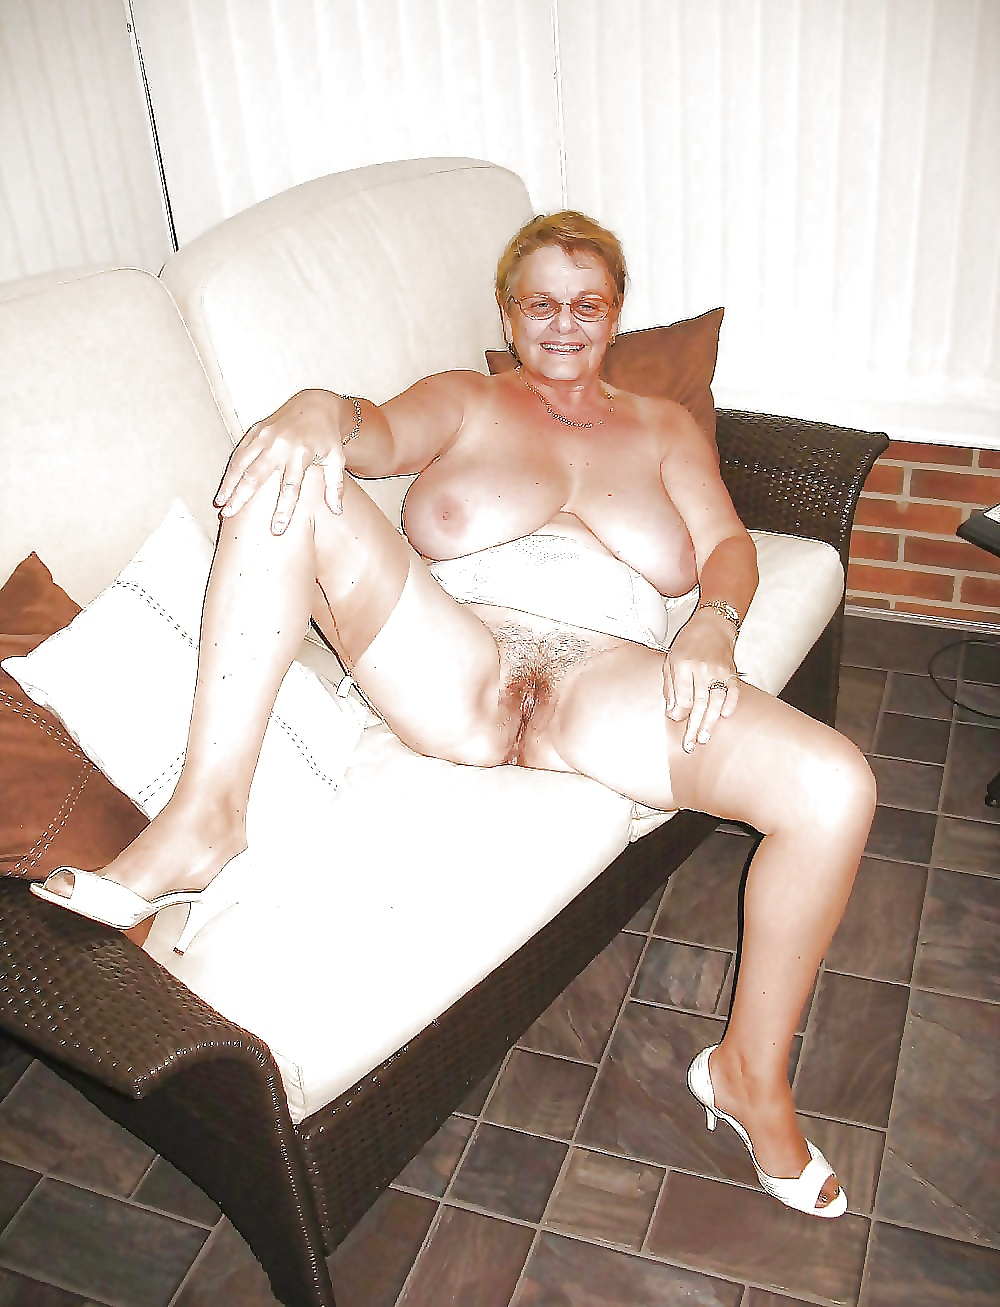 nude shruti seth videos on you tube